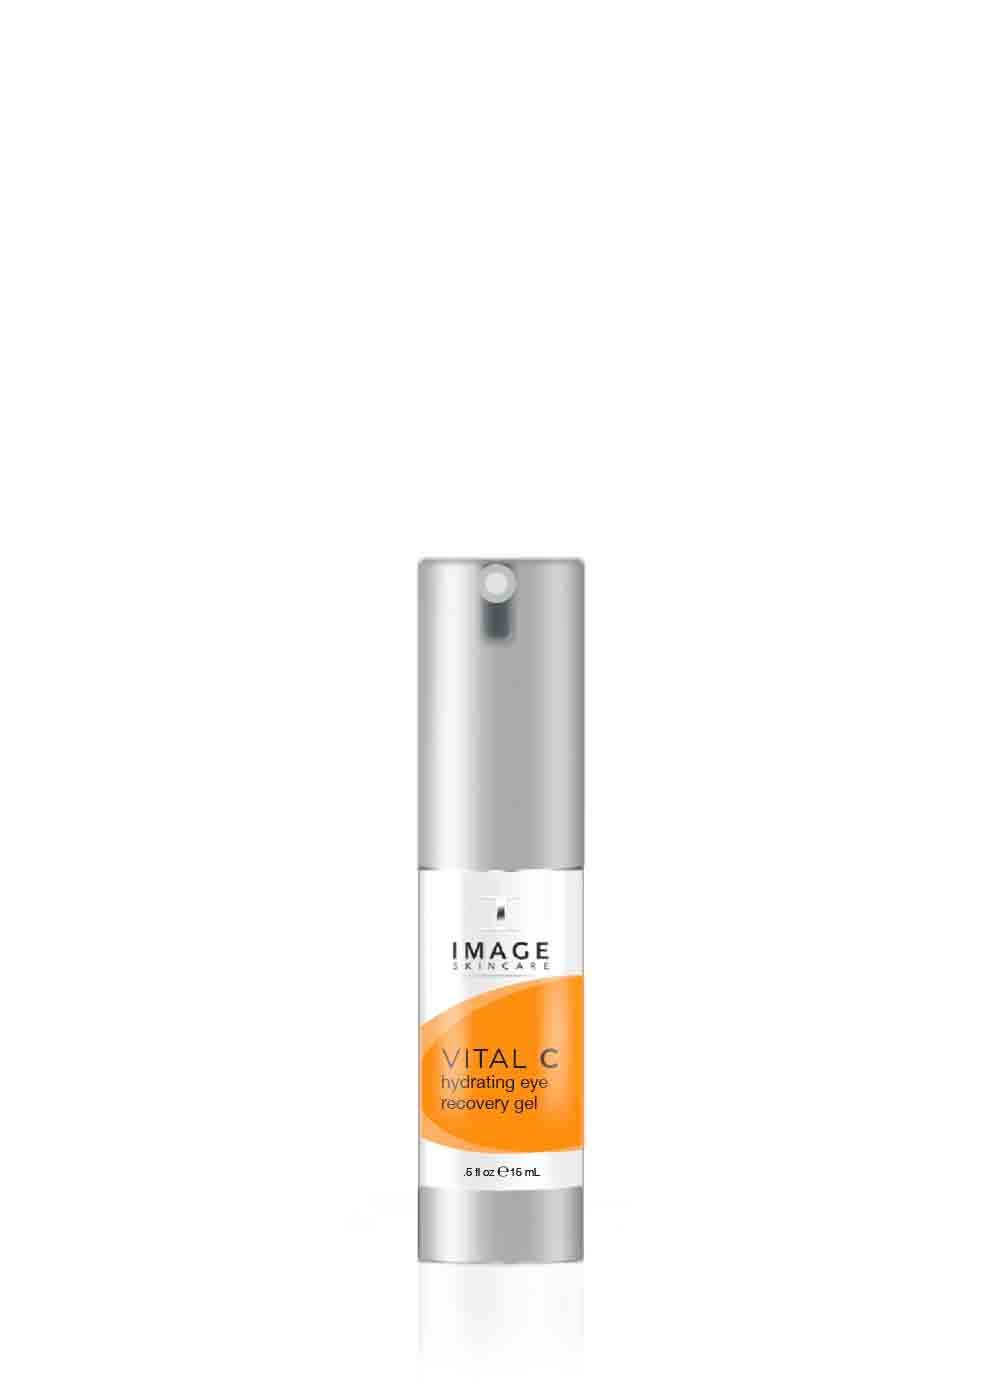 VITAL C hydrating eye recovery gel contour yeux hydratant